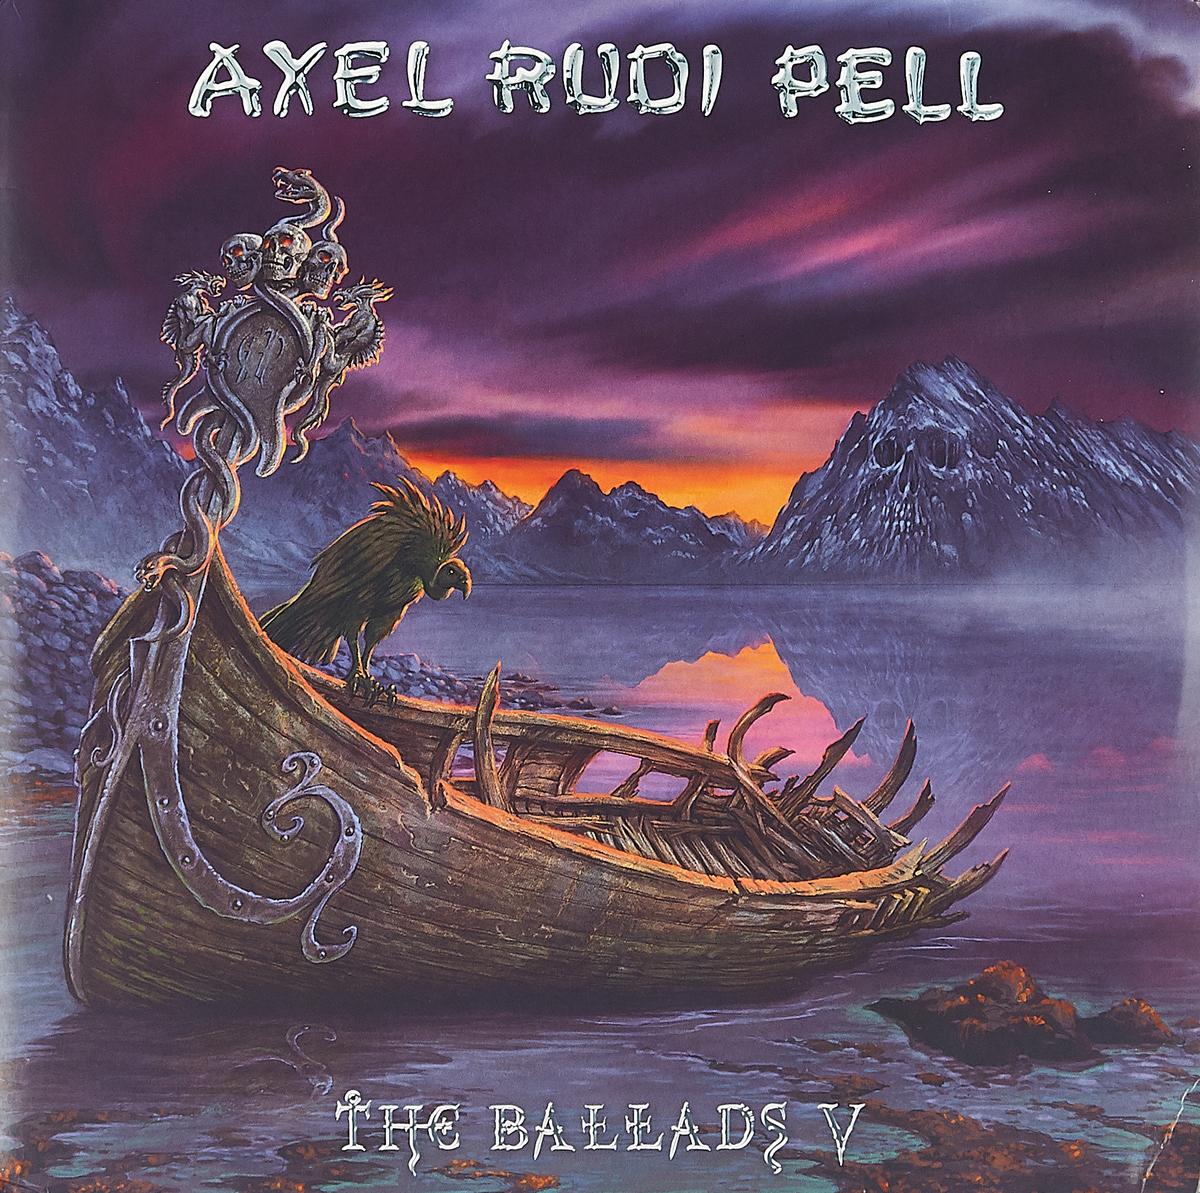 Аксель Руди Пелл Axel Rudi Pell. The Ballads V (2 LP + CD)